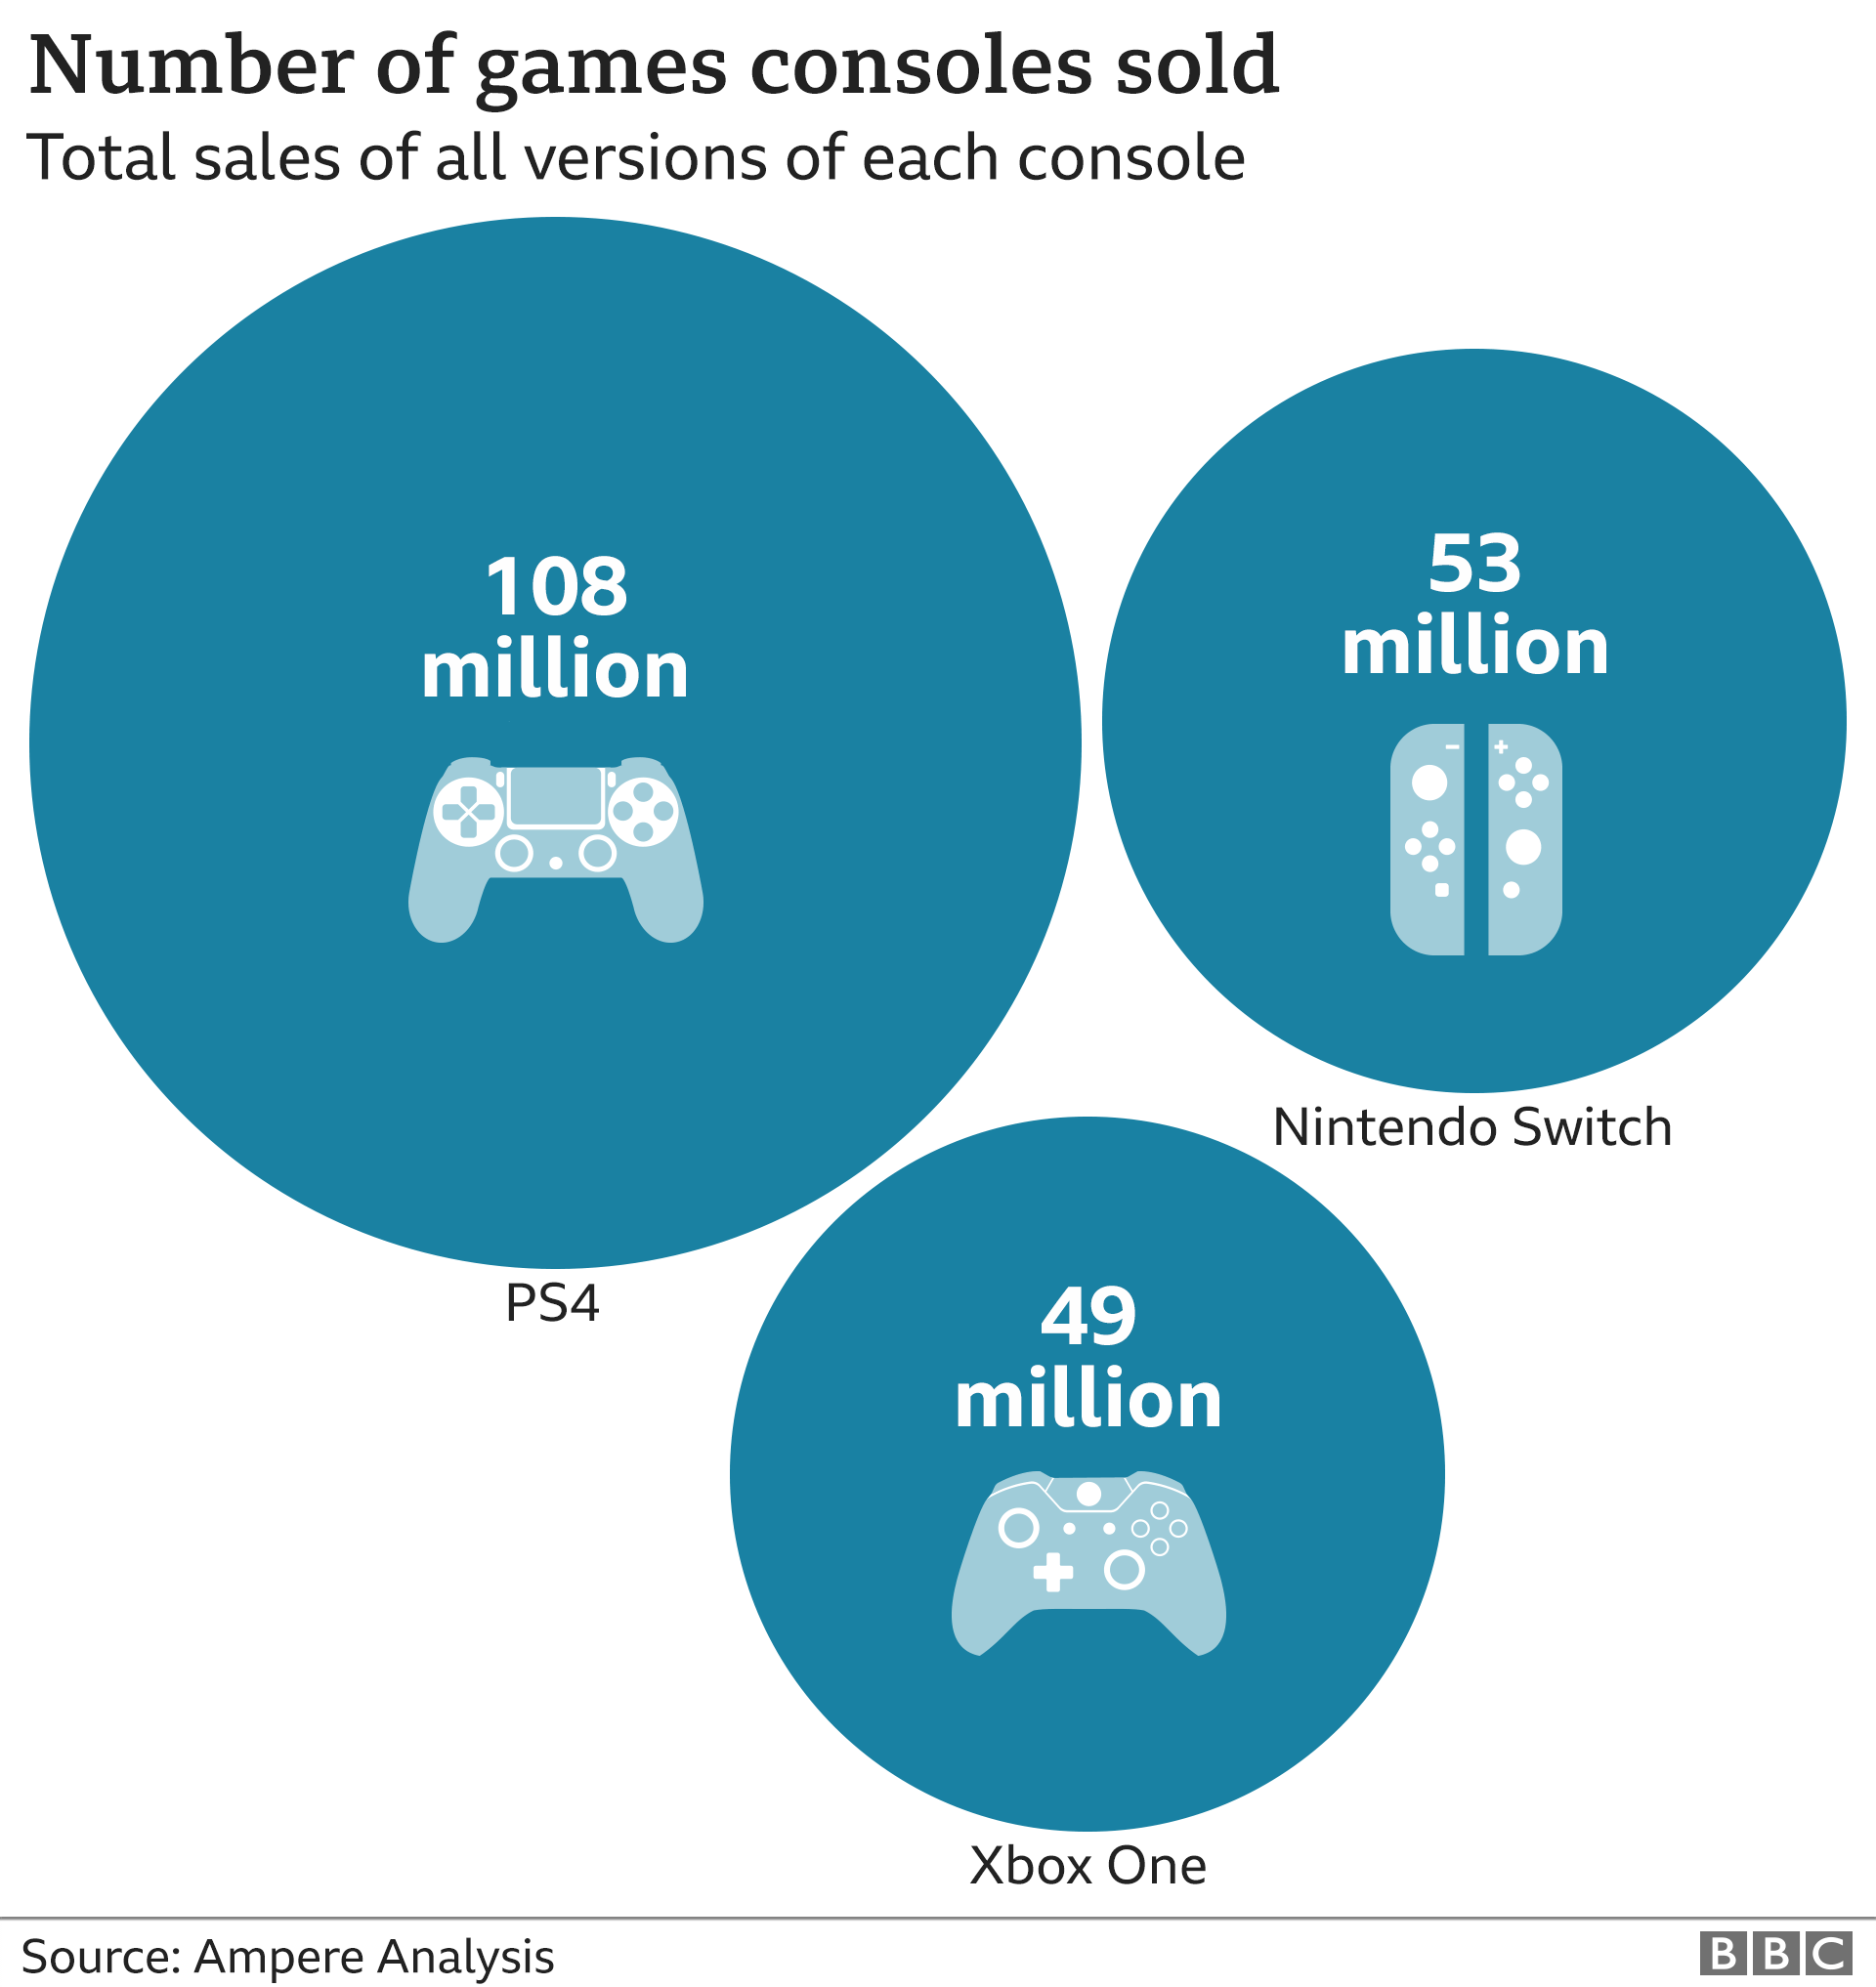 Console sales